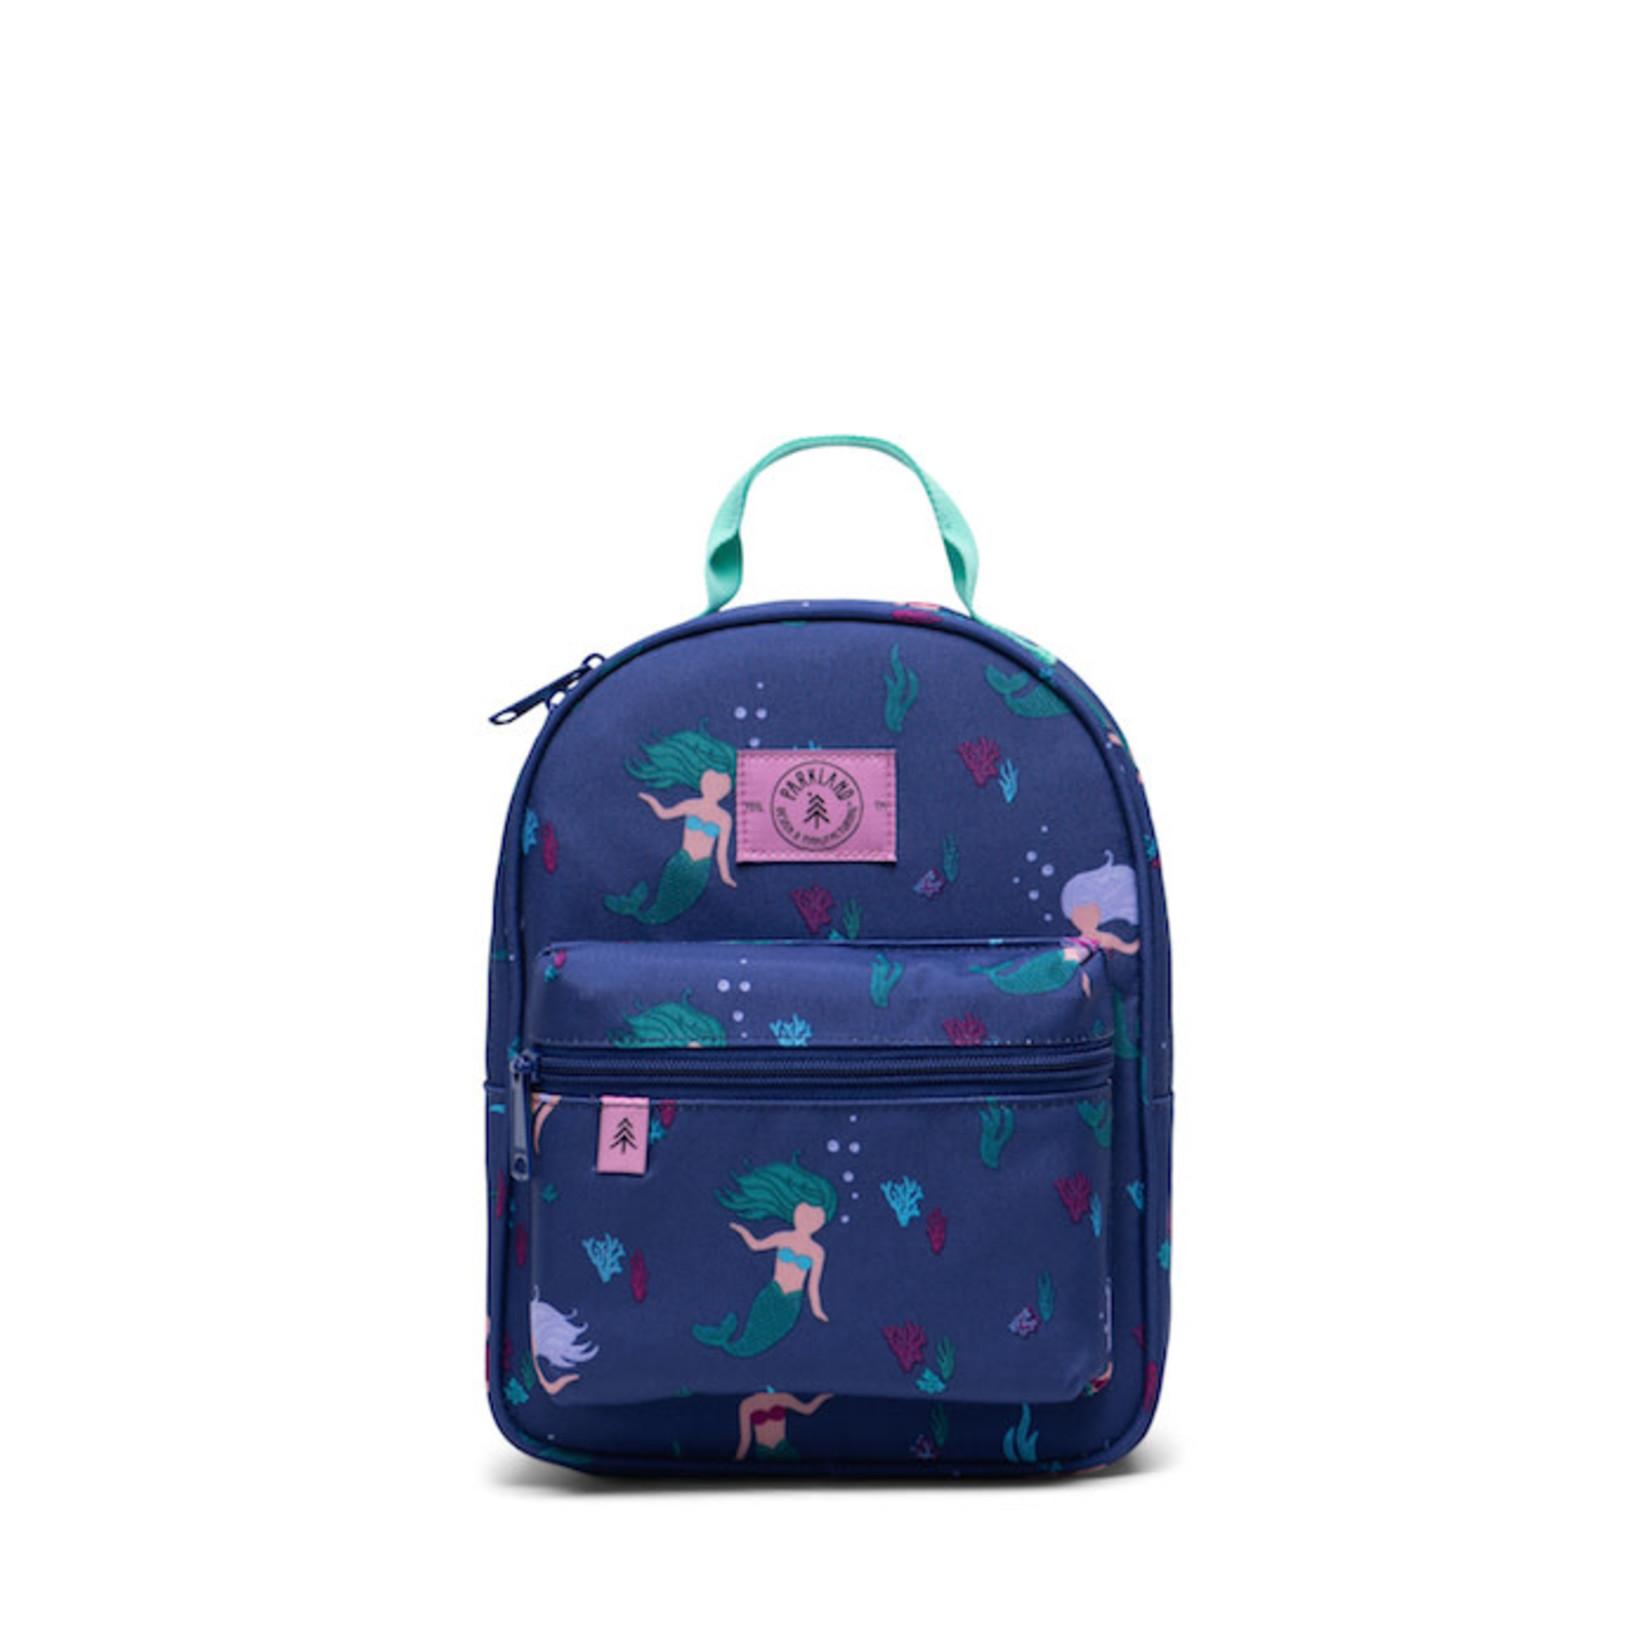 PARKLAND PARKLAND backpack Goldie mermaids